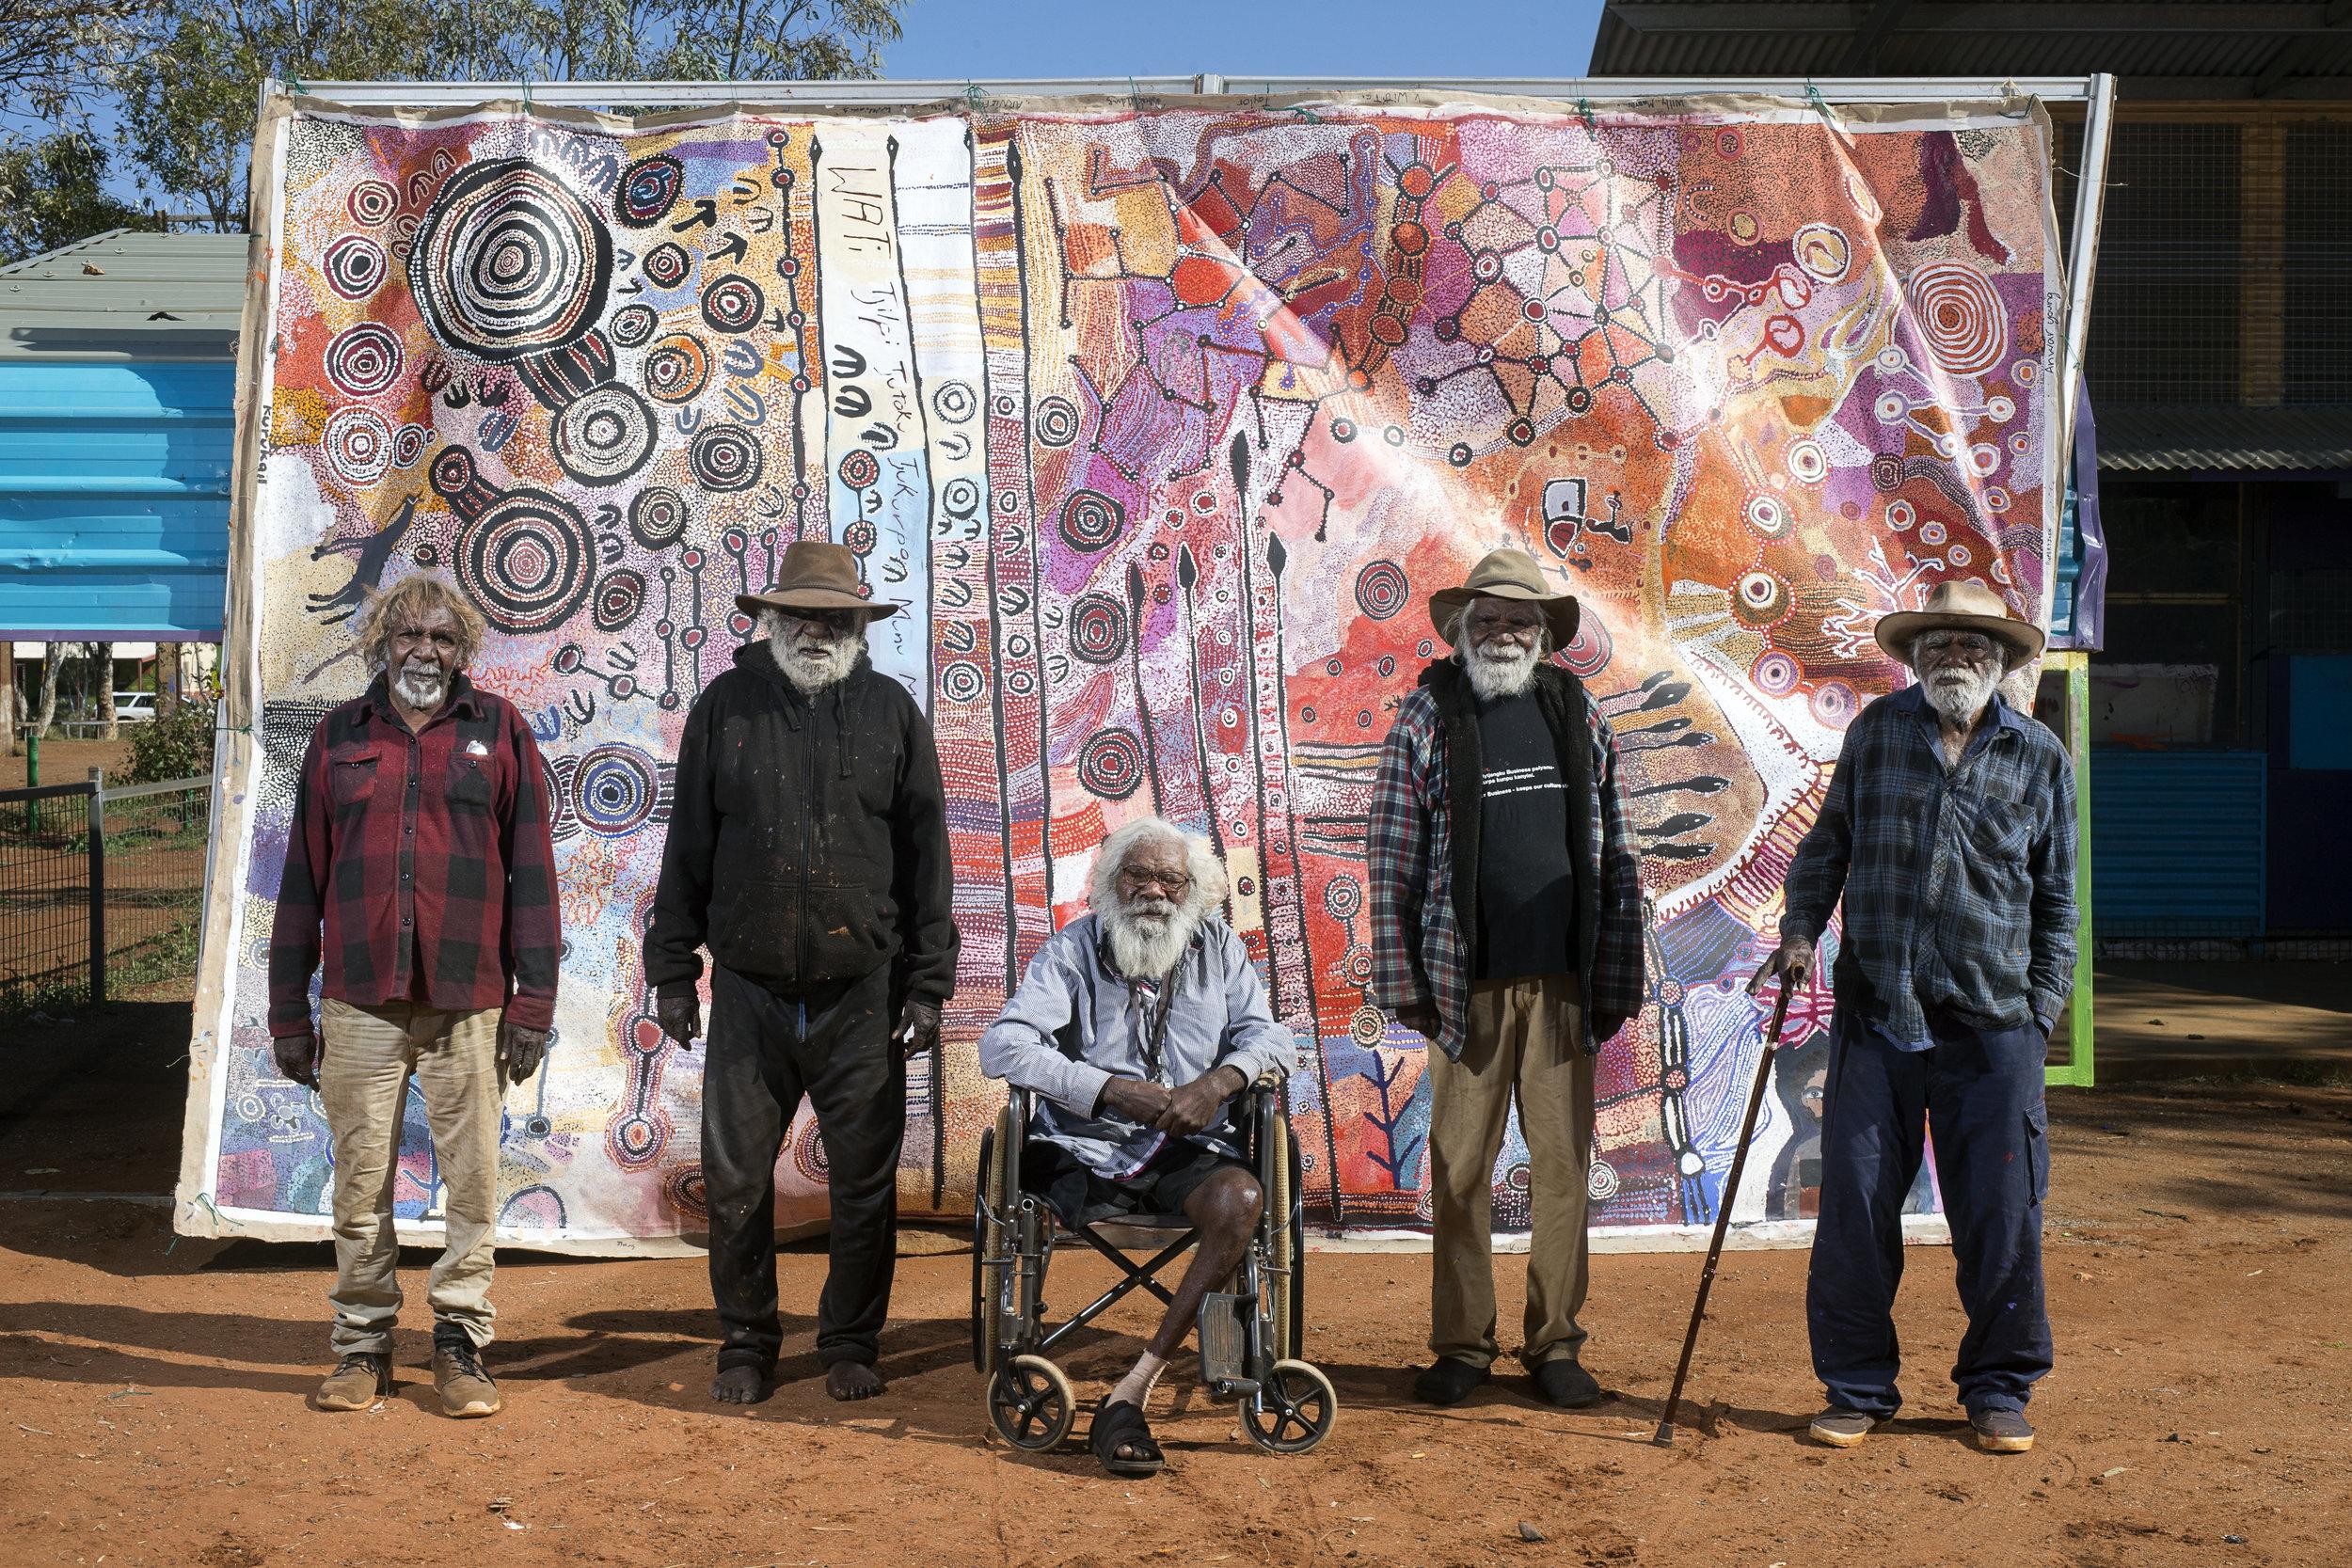 Ronnie Douglas, Brenton Ken, Willy Kaika, Mick Wikilyiri and Ray Ken. APY Men's collaborative painting 2016 Photography credit Rhett Hammerton 2016